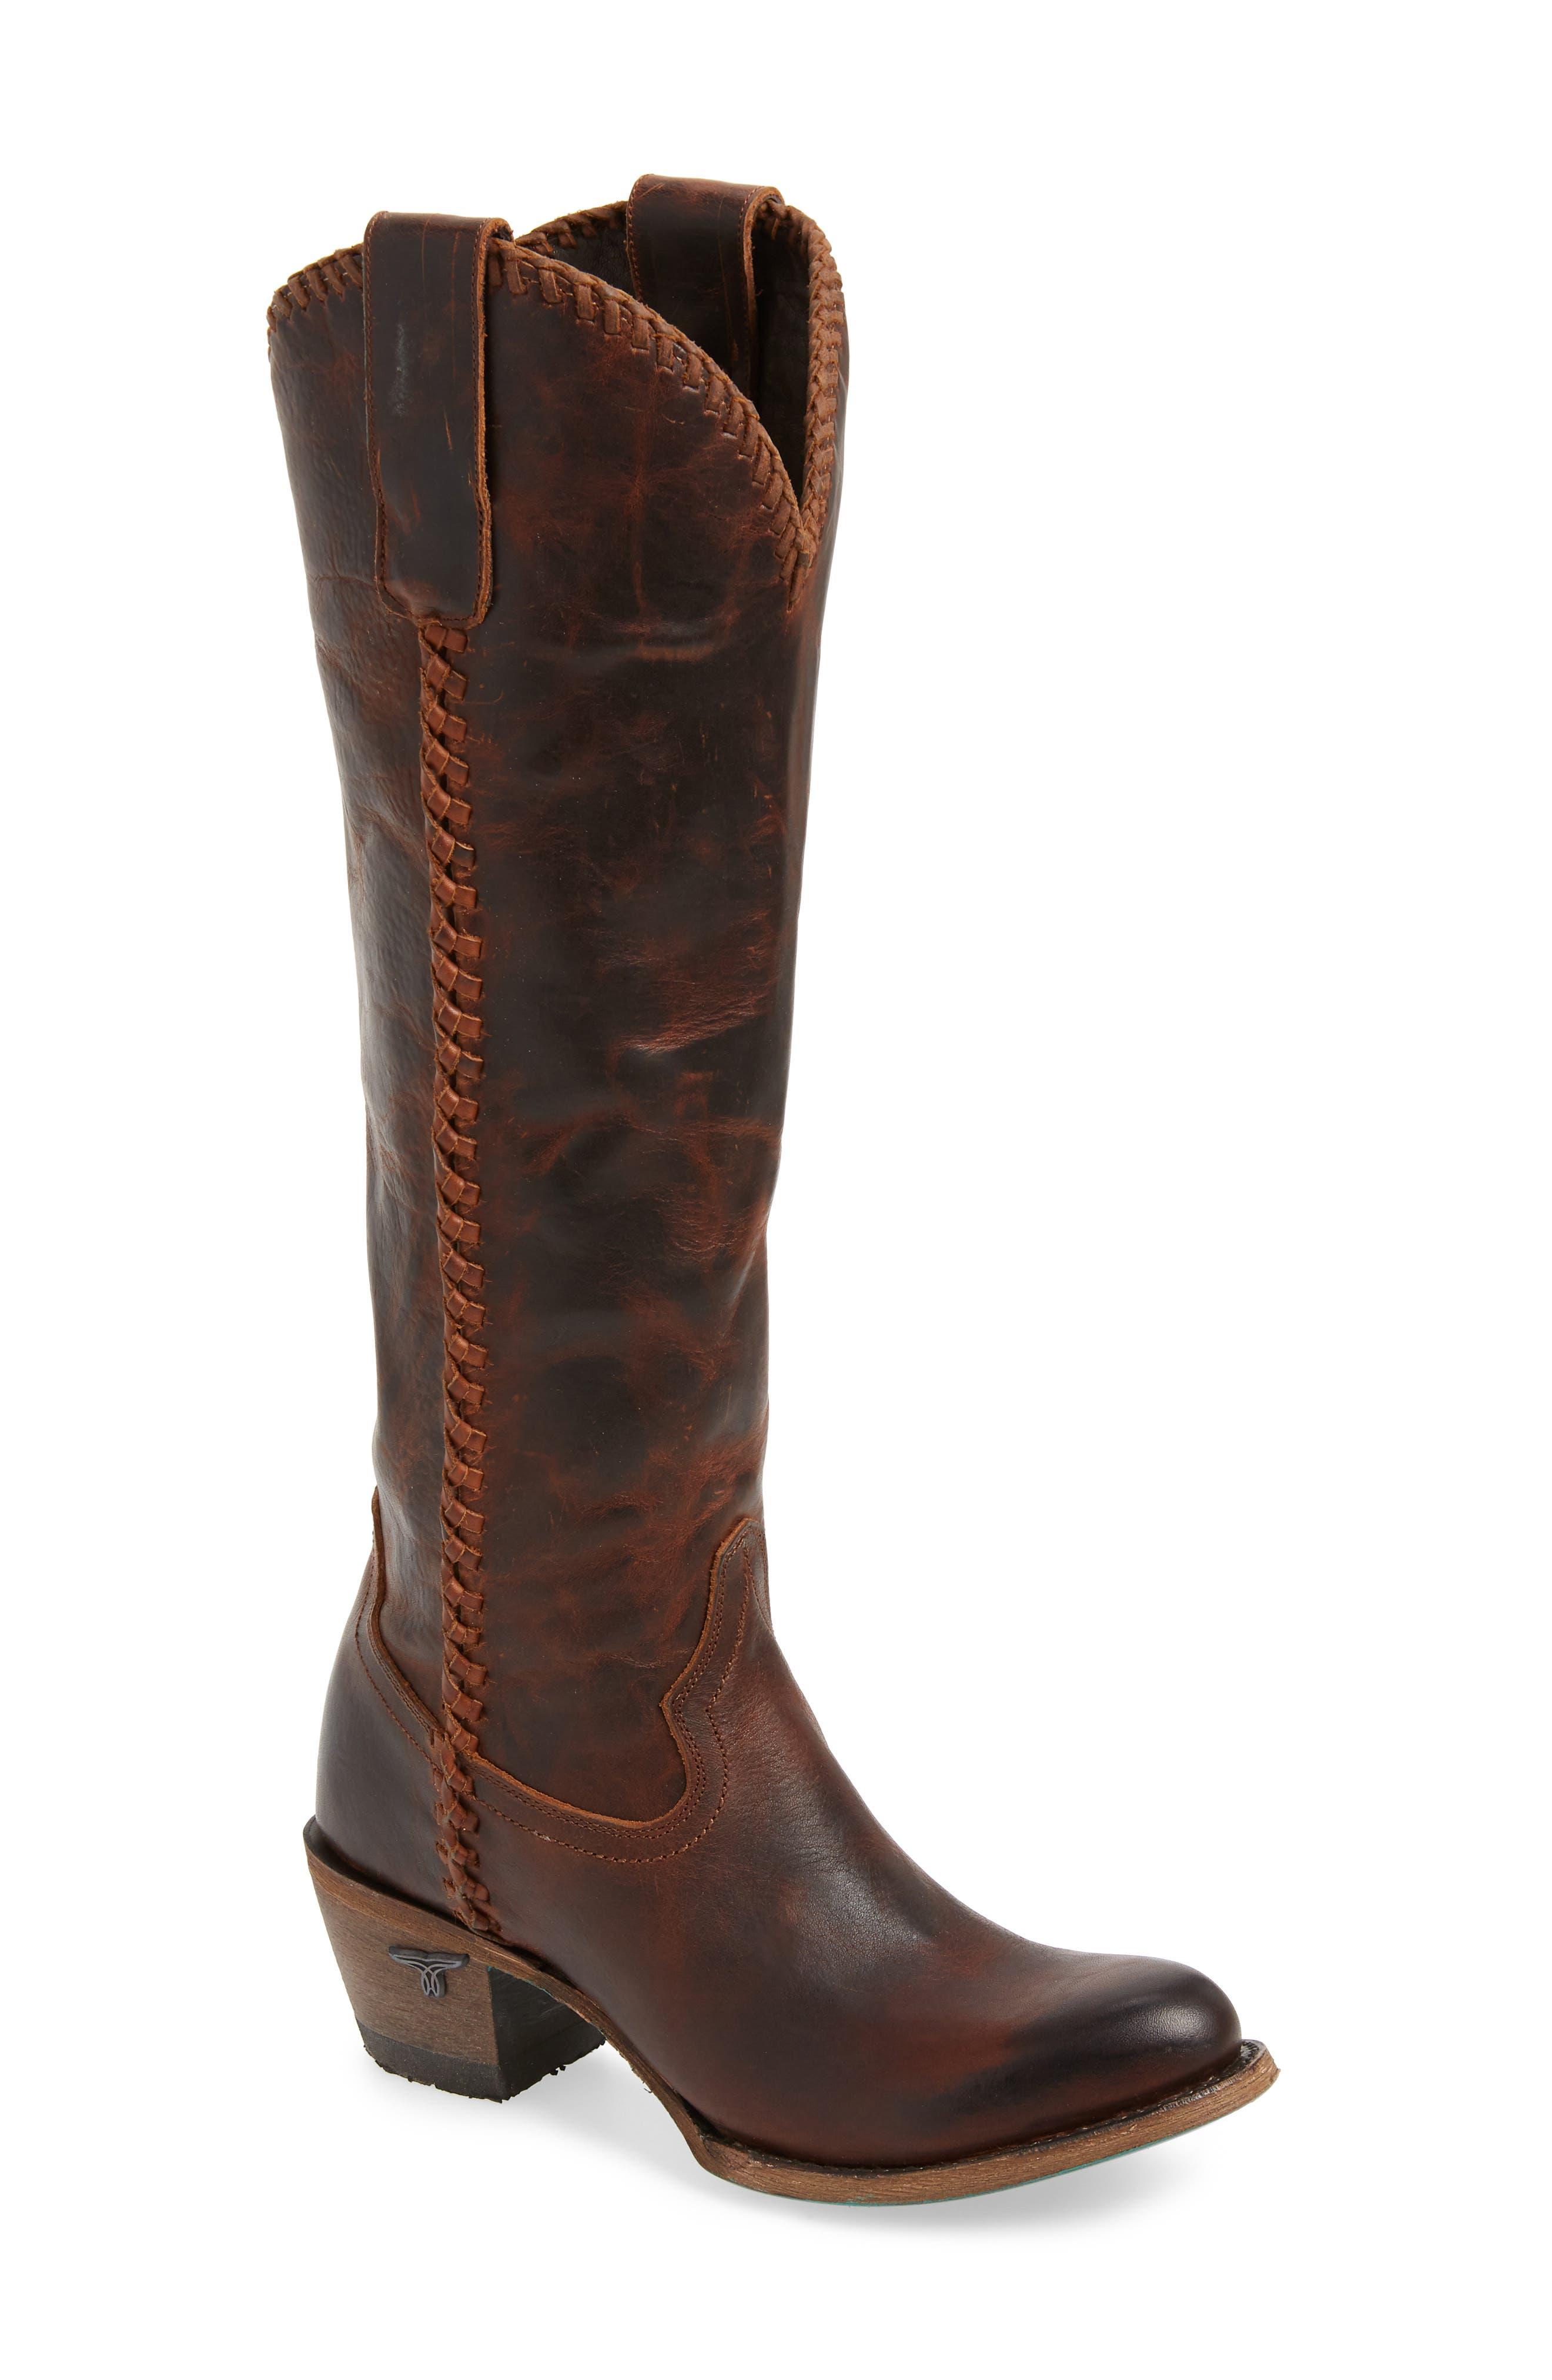 LANE BOOTS,                             Plain Jane Knee High Western Boot,                             Main thumbnail 1, color,                             COGNAC LEATHER